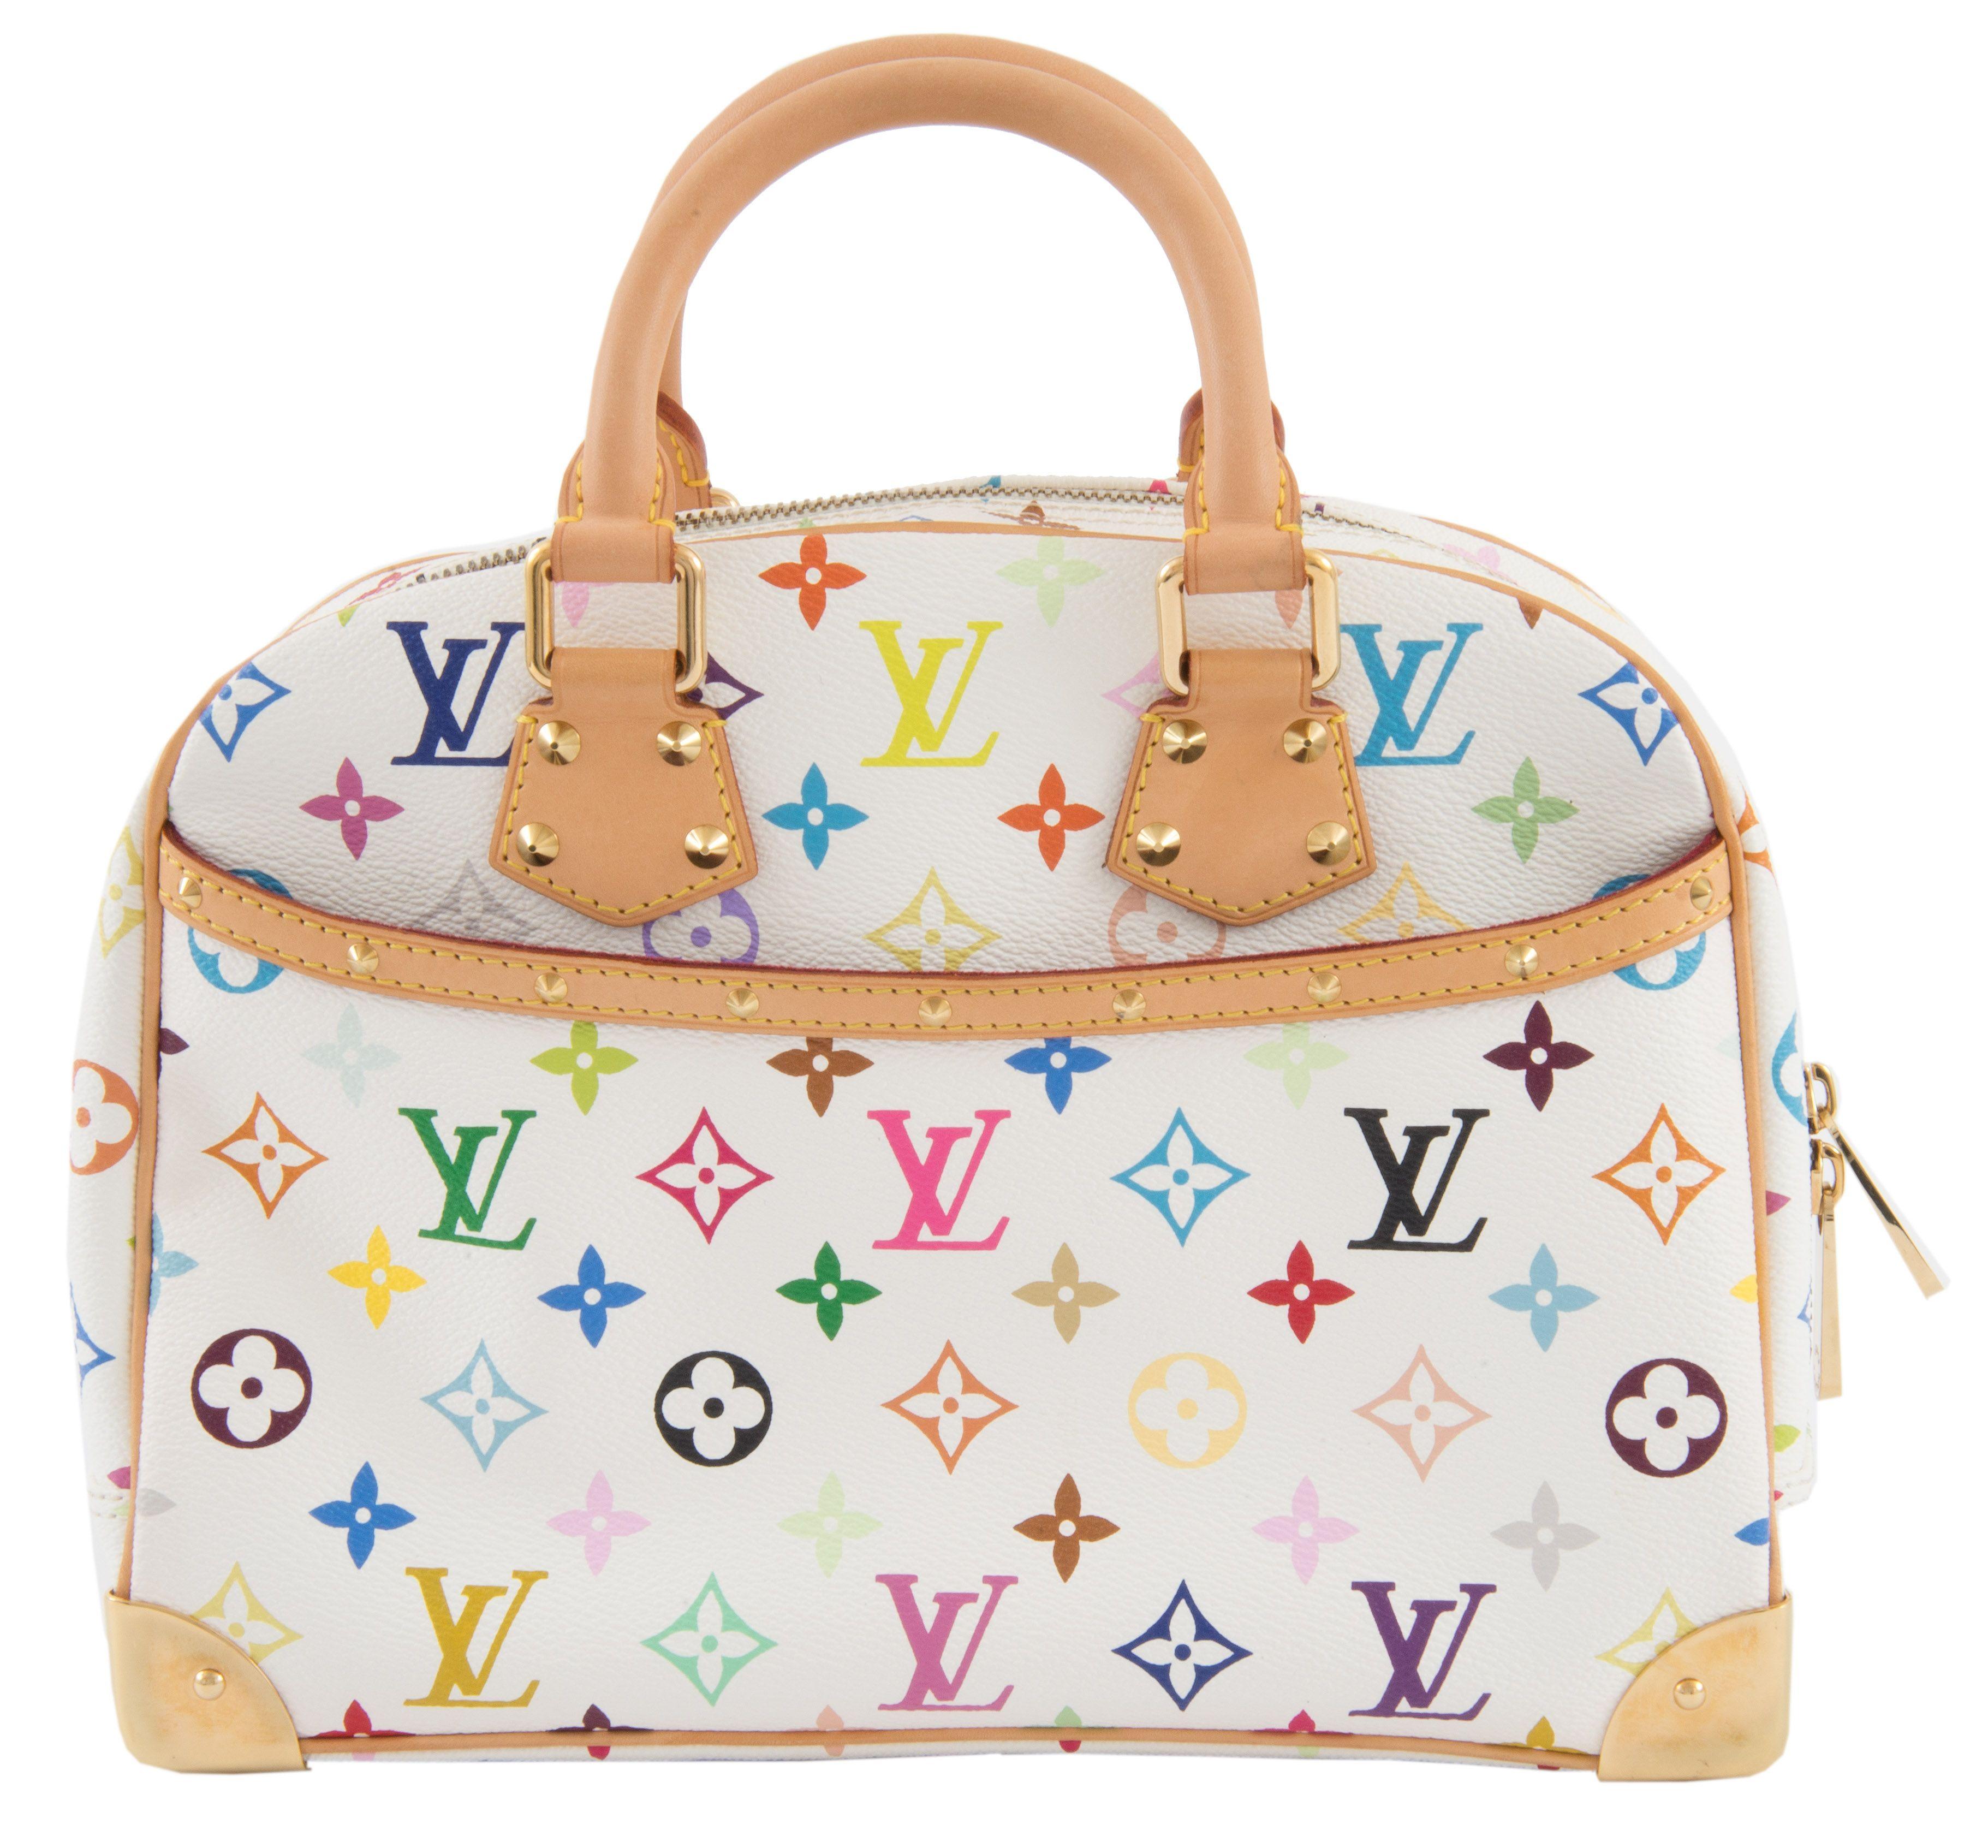 Preownedhandbags Co Uk Louis Vuitton Trouville Handbag